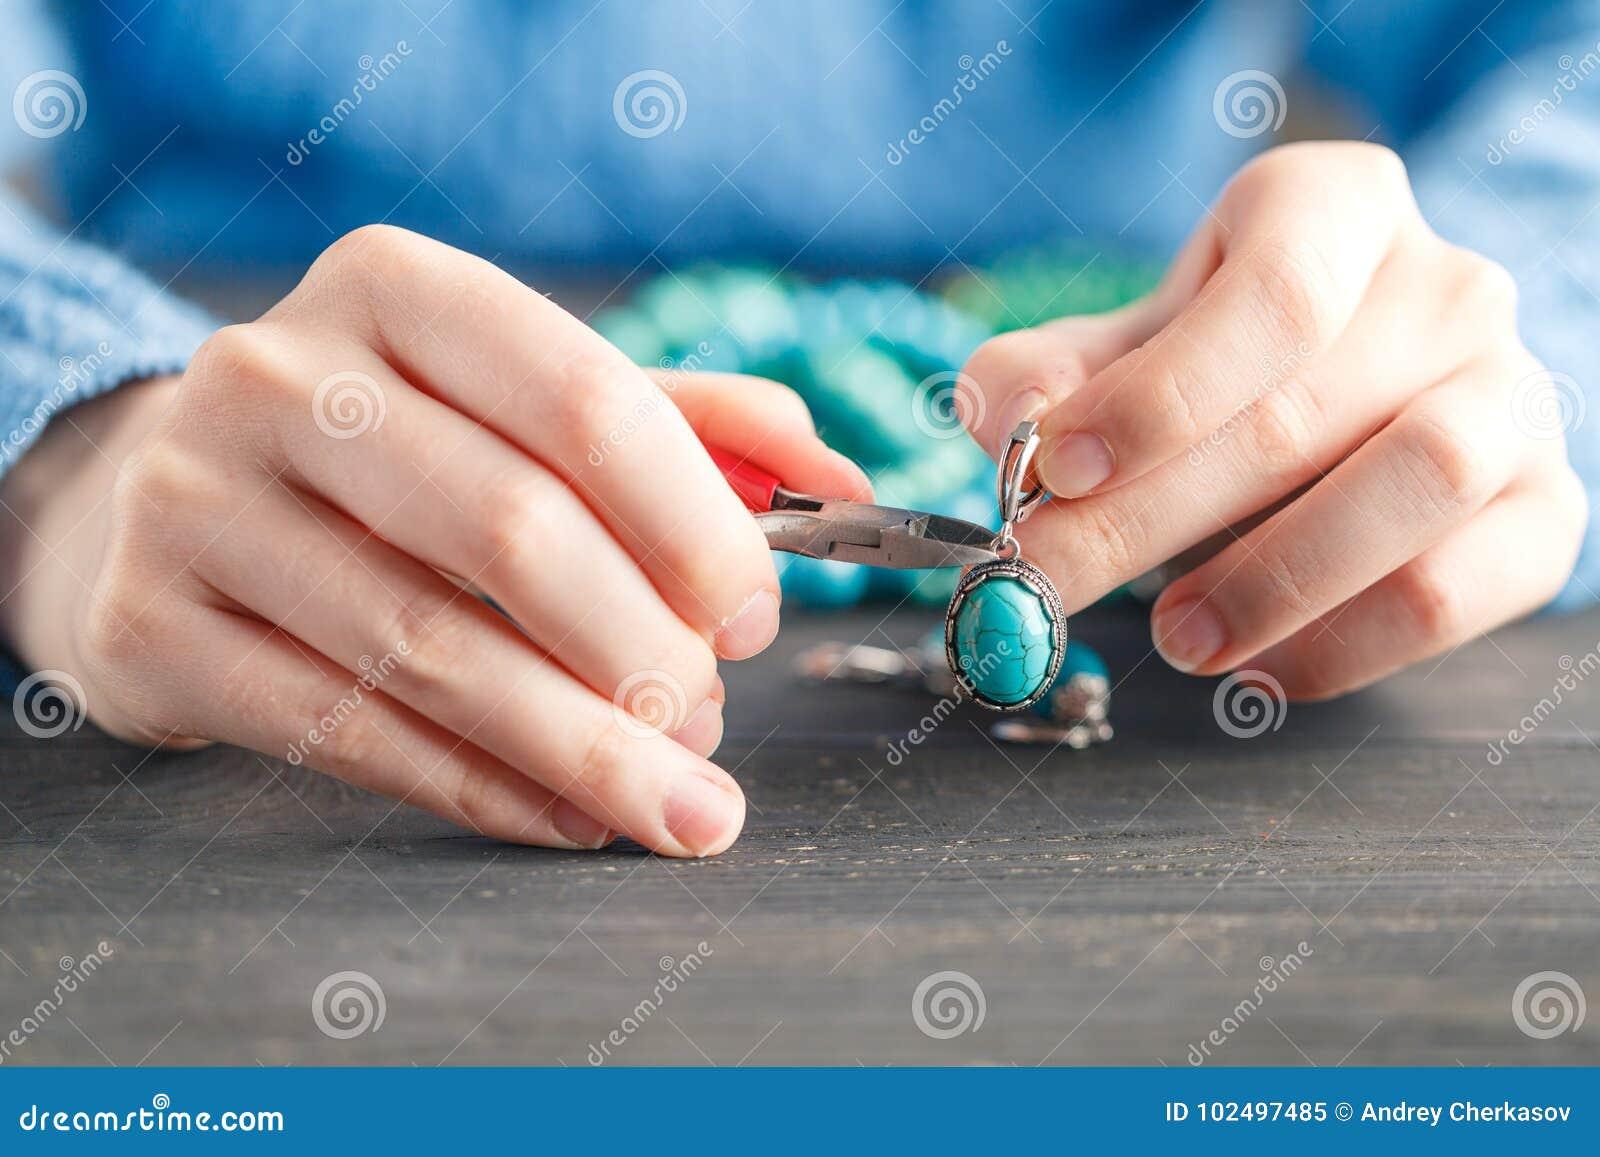 Handmade earrings making, home workshop. Woman artisan create tassel jewelry. Art, hobby, handicraft concept